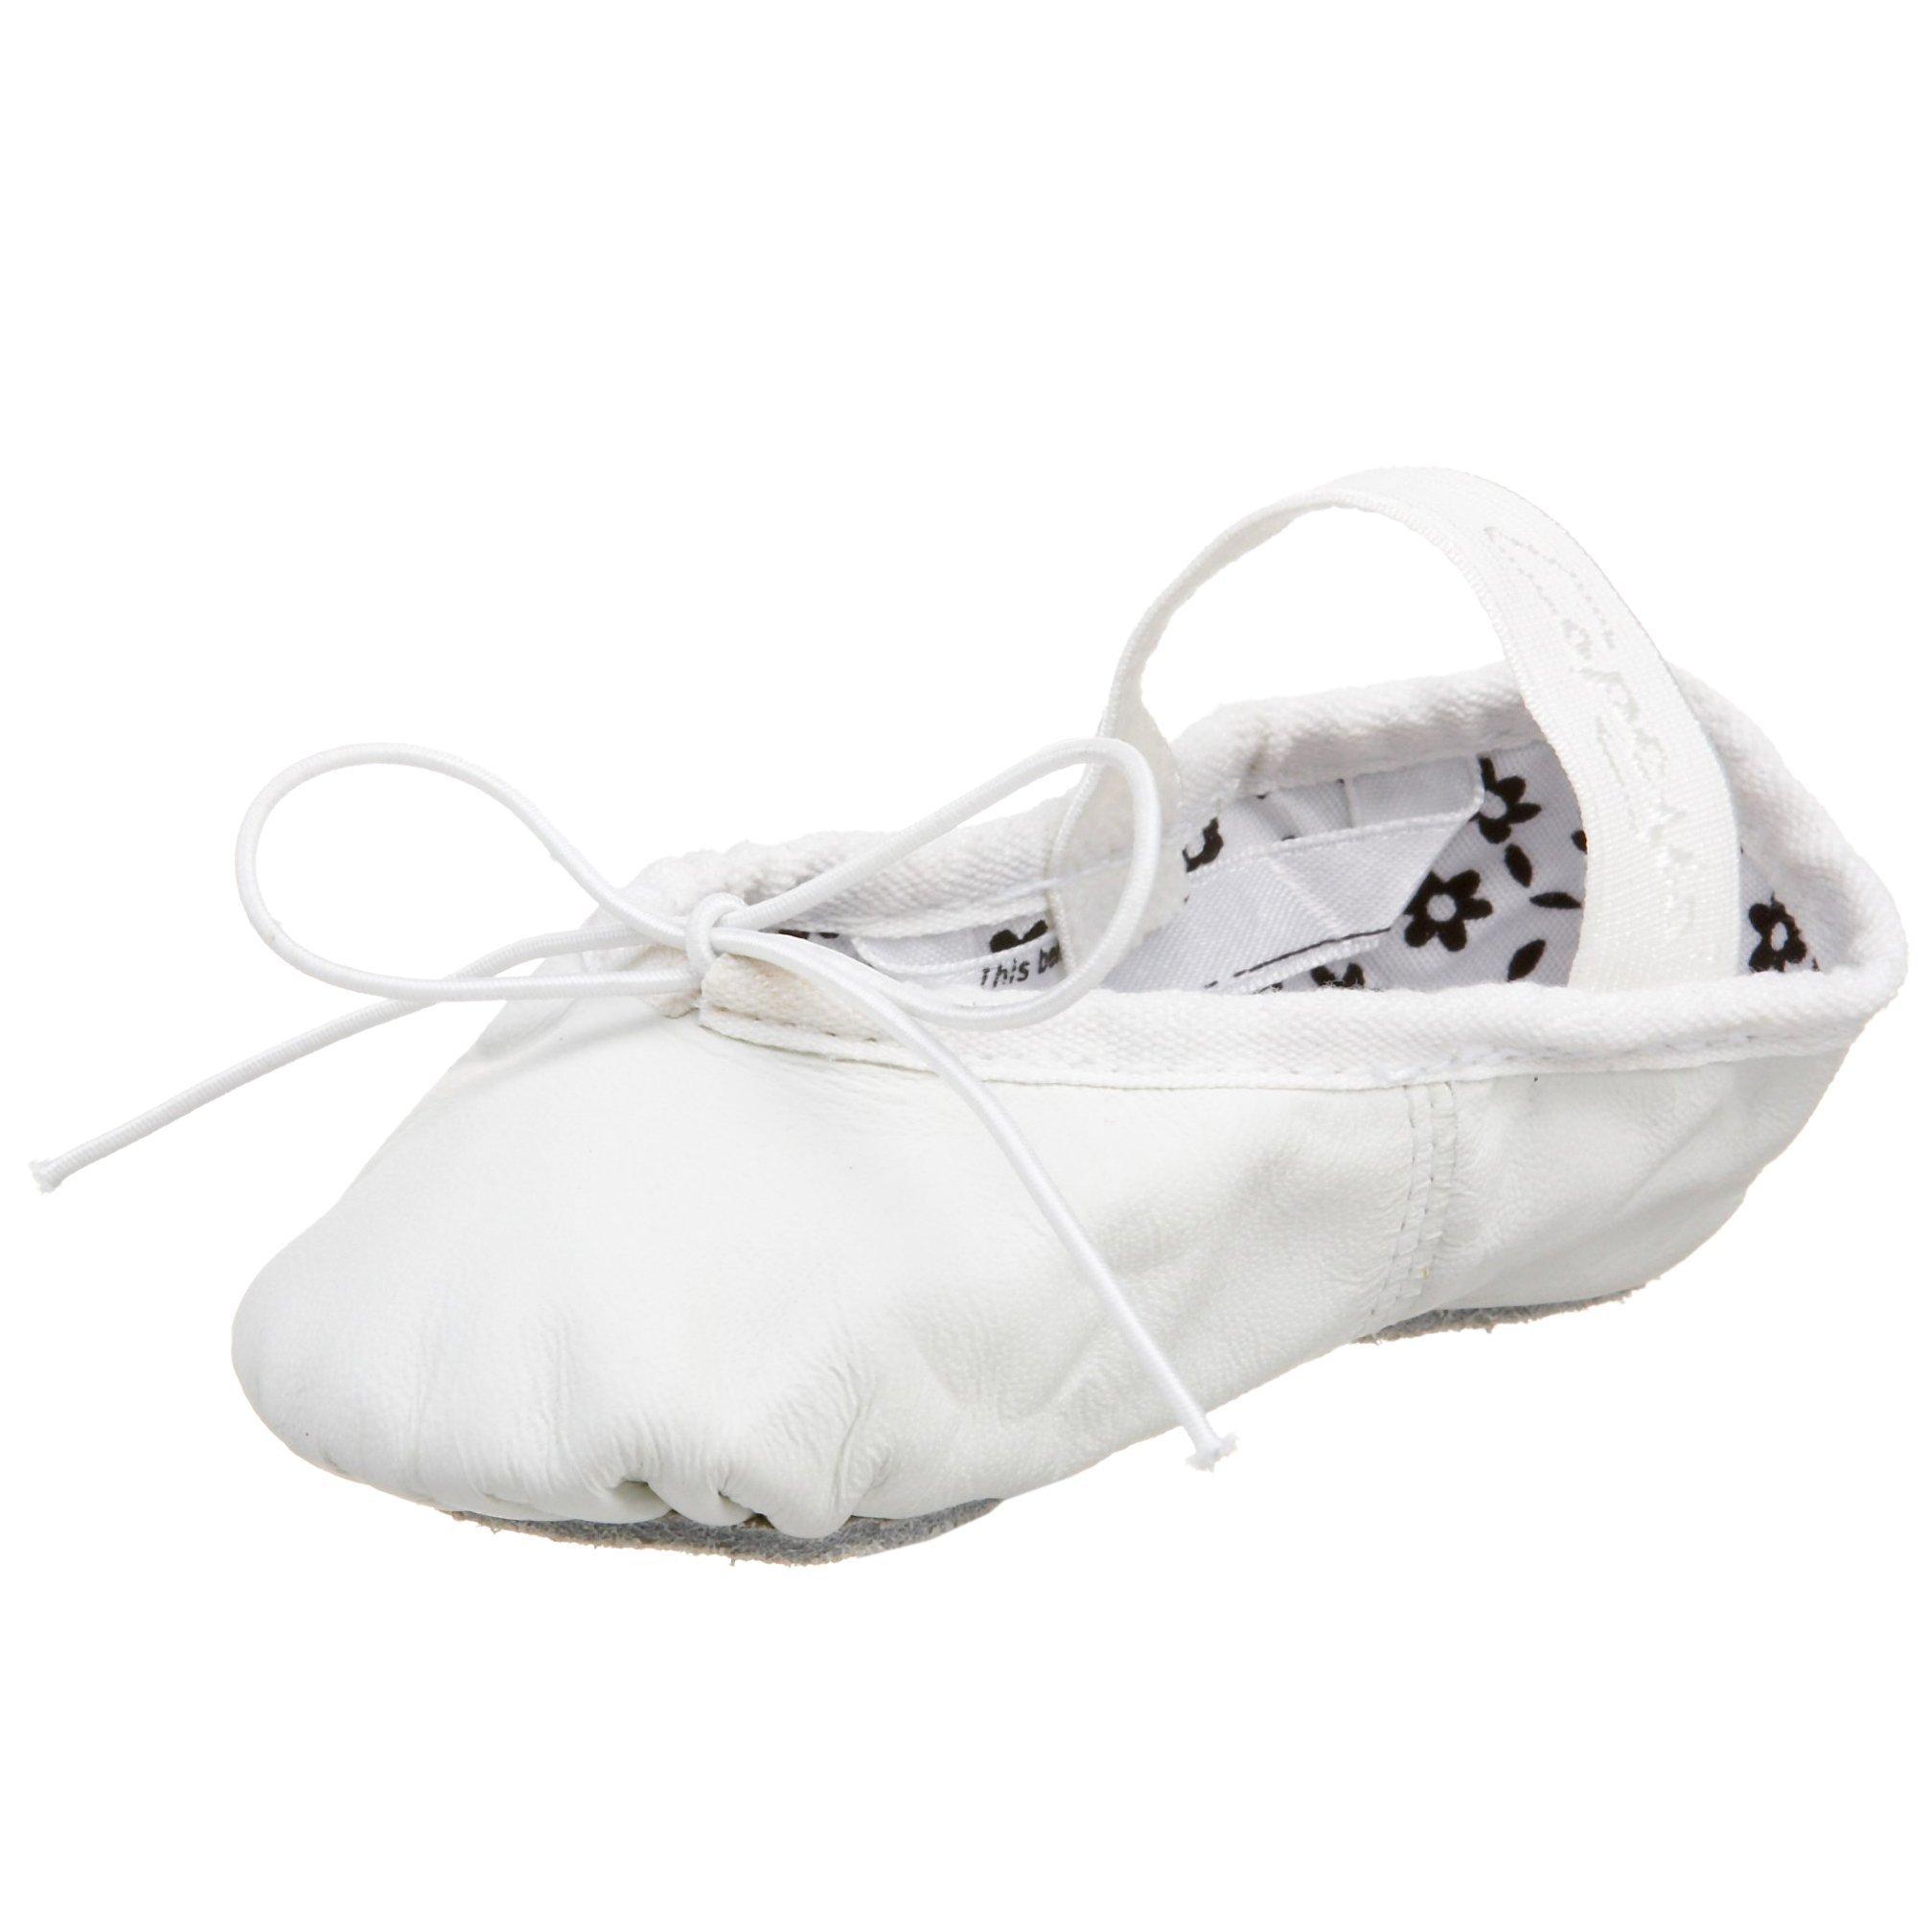 Capezio Daisy 205 Ballet Shoe (Toddler/Little Kid),White,9 M US Toddler